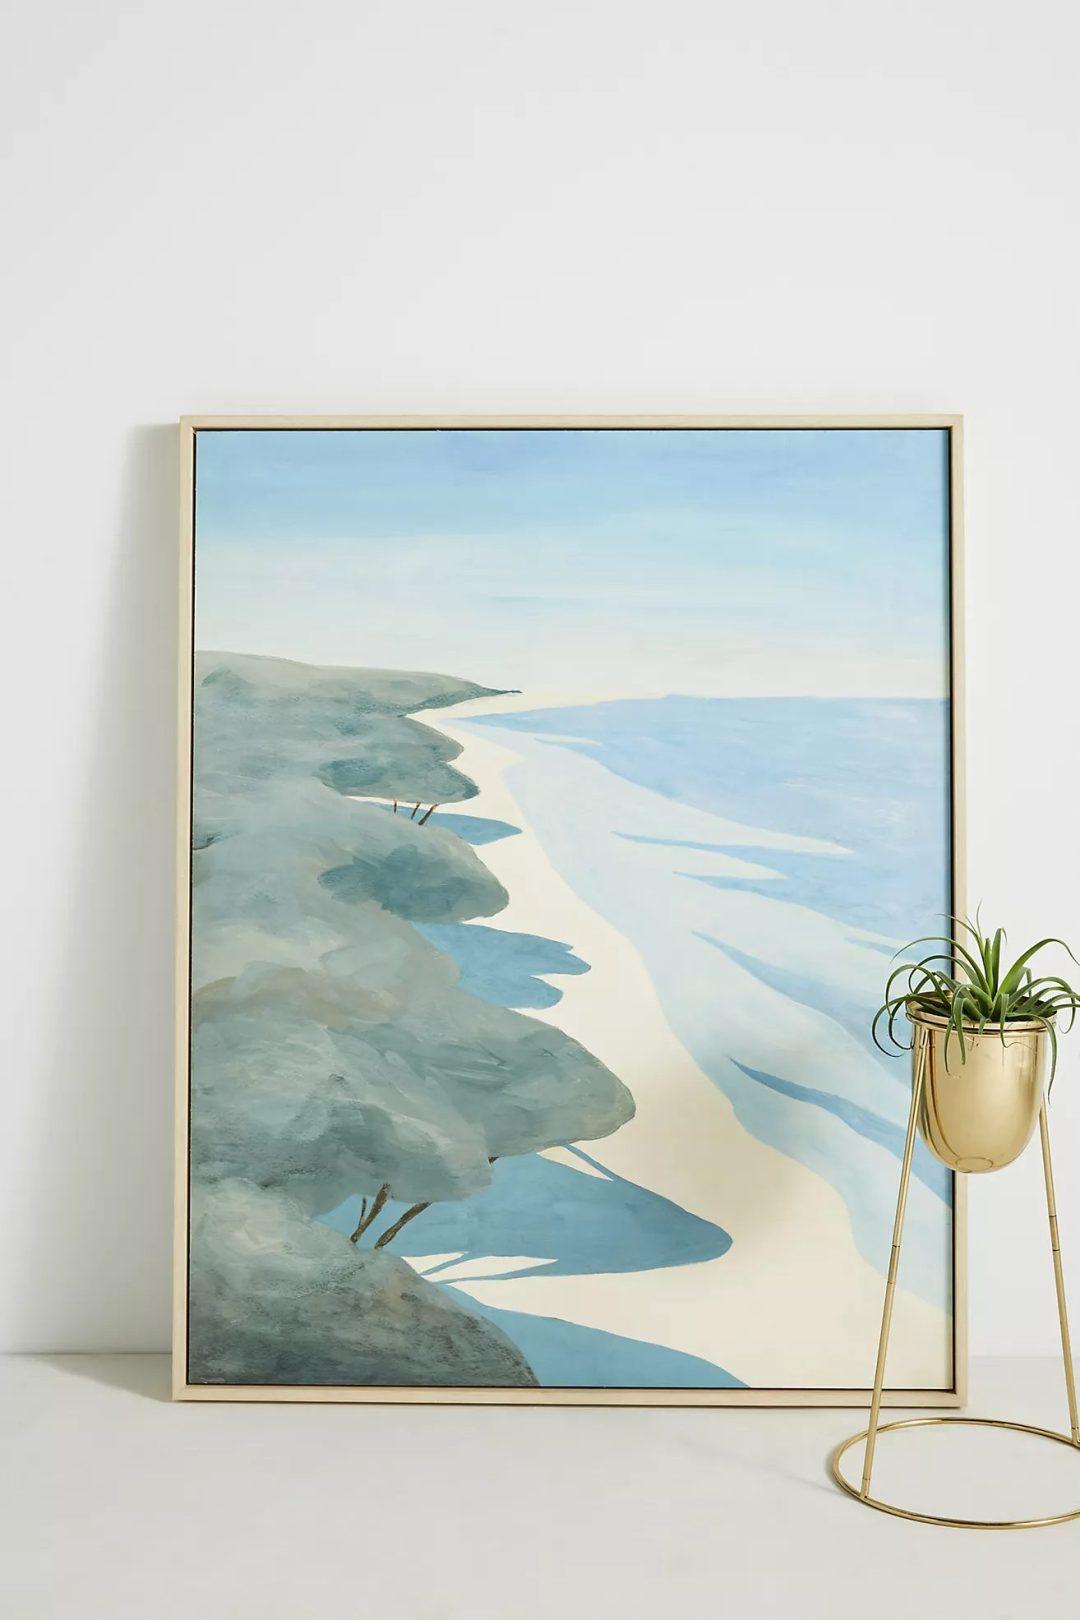 Calming blue sea painting